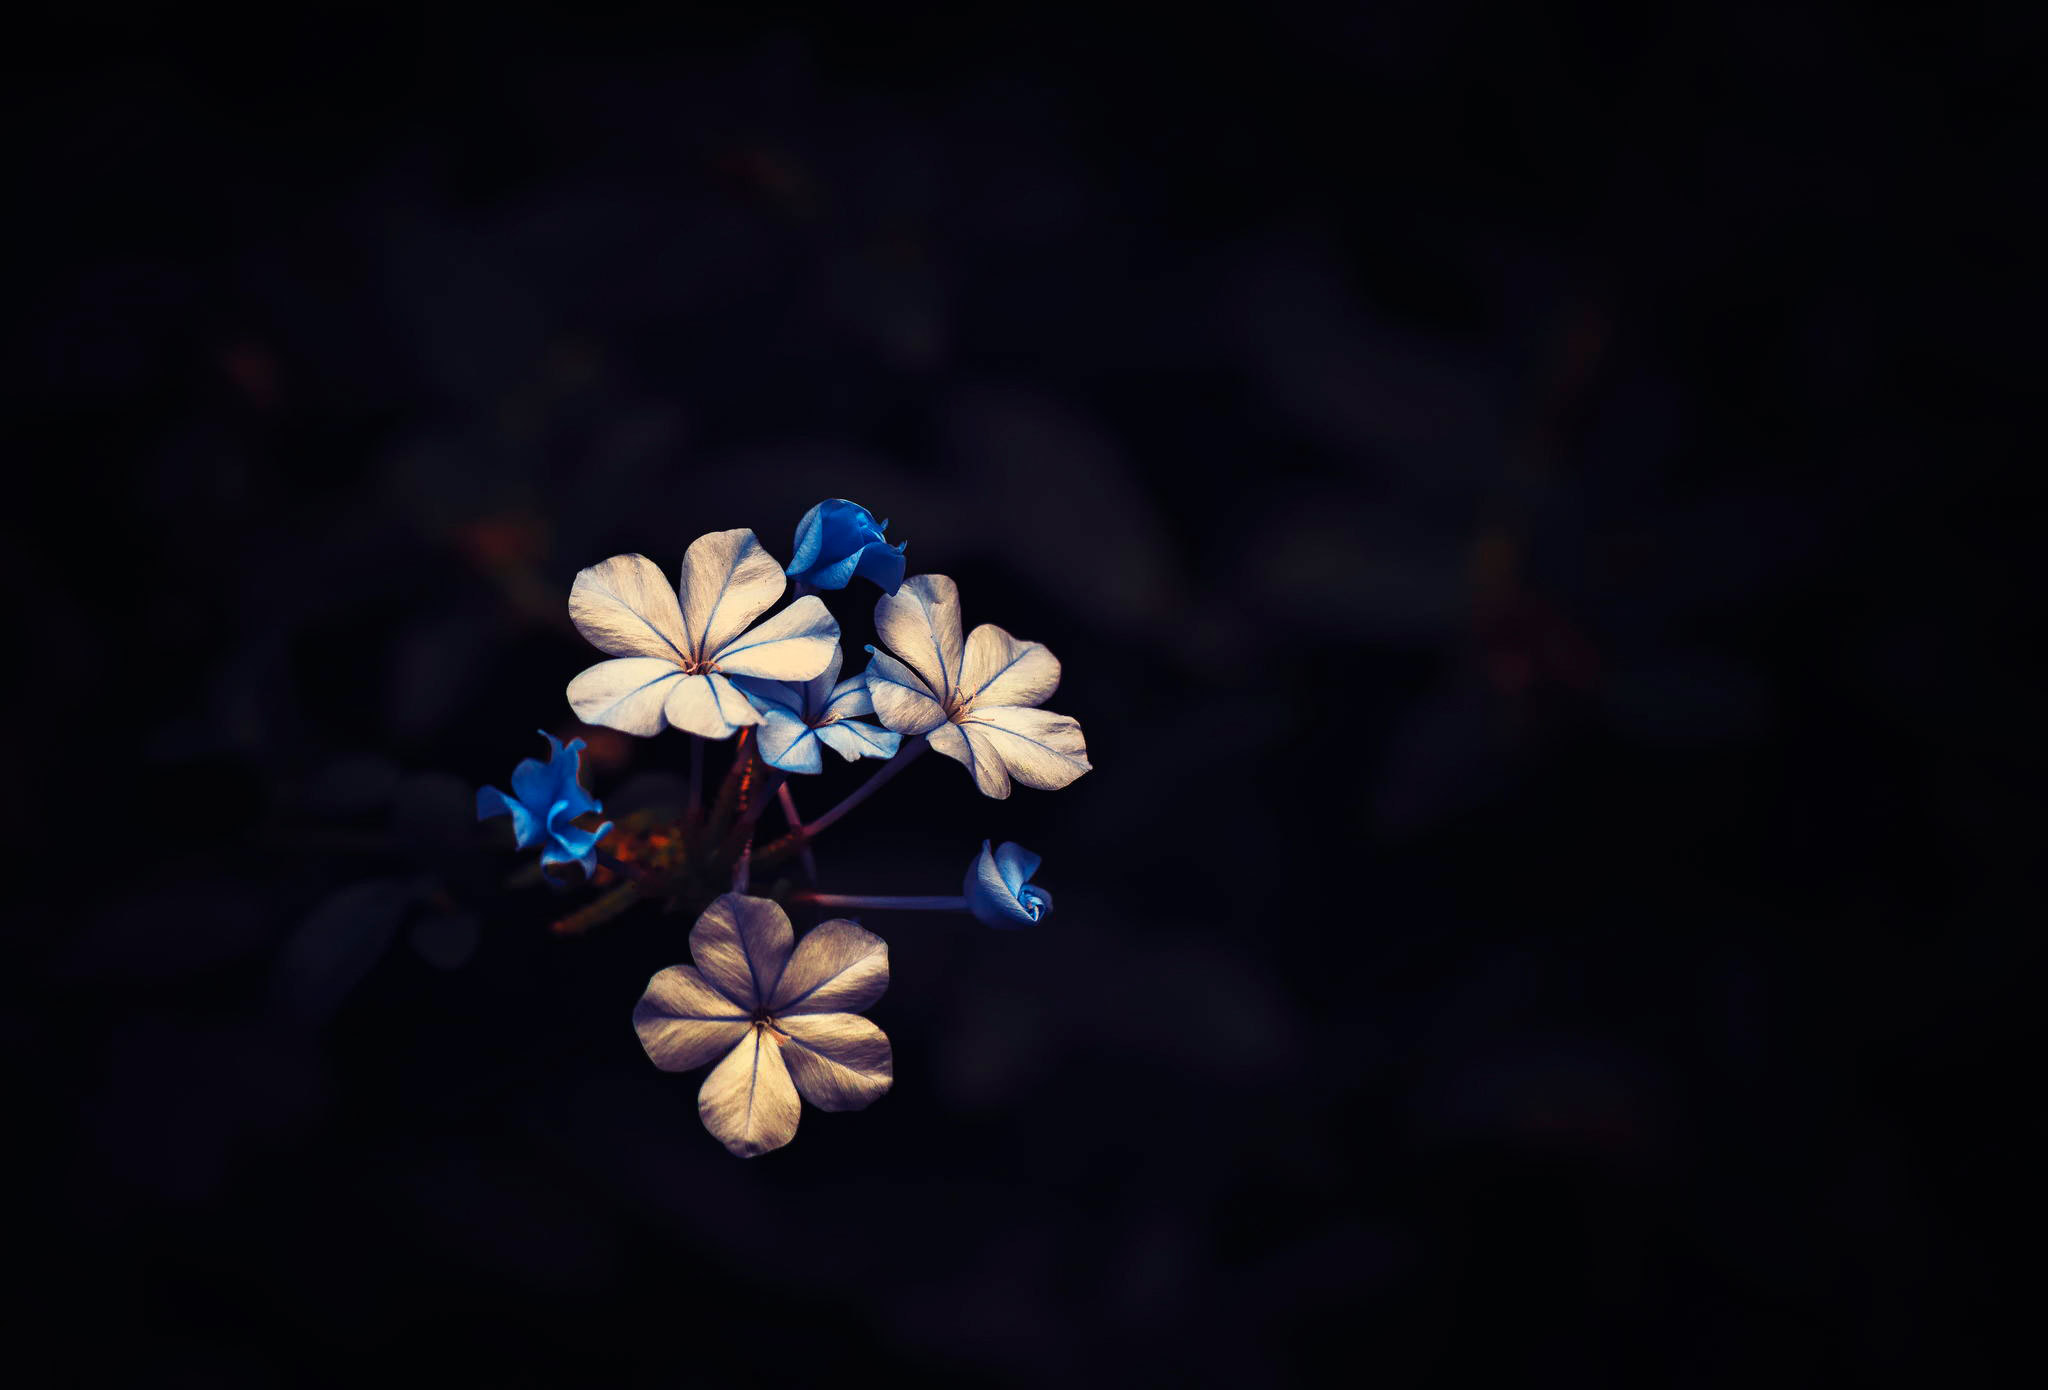 Flowers on Black Background Wallpaper - WallpaperSafari